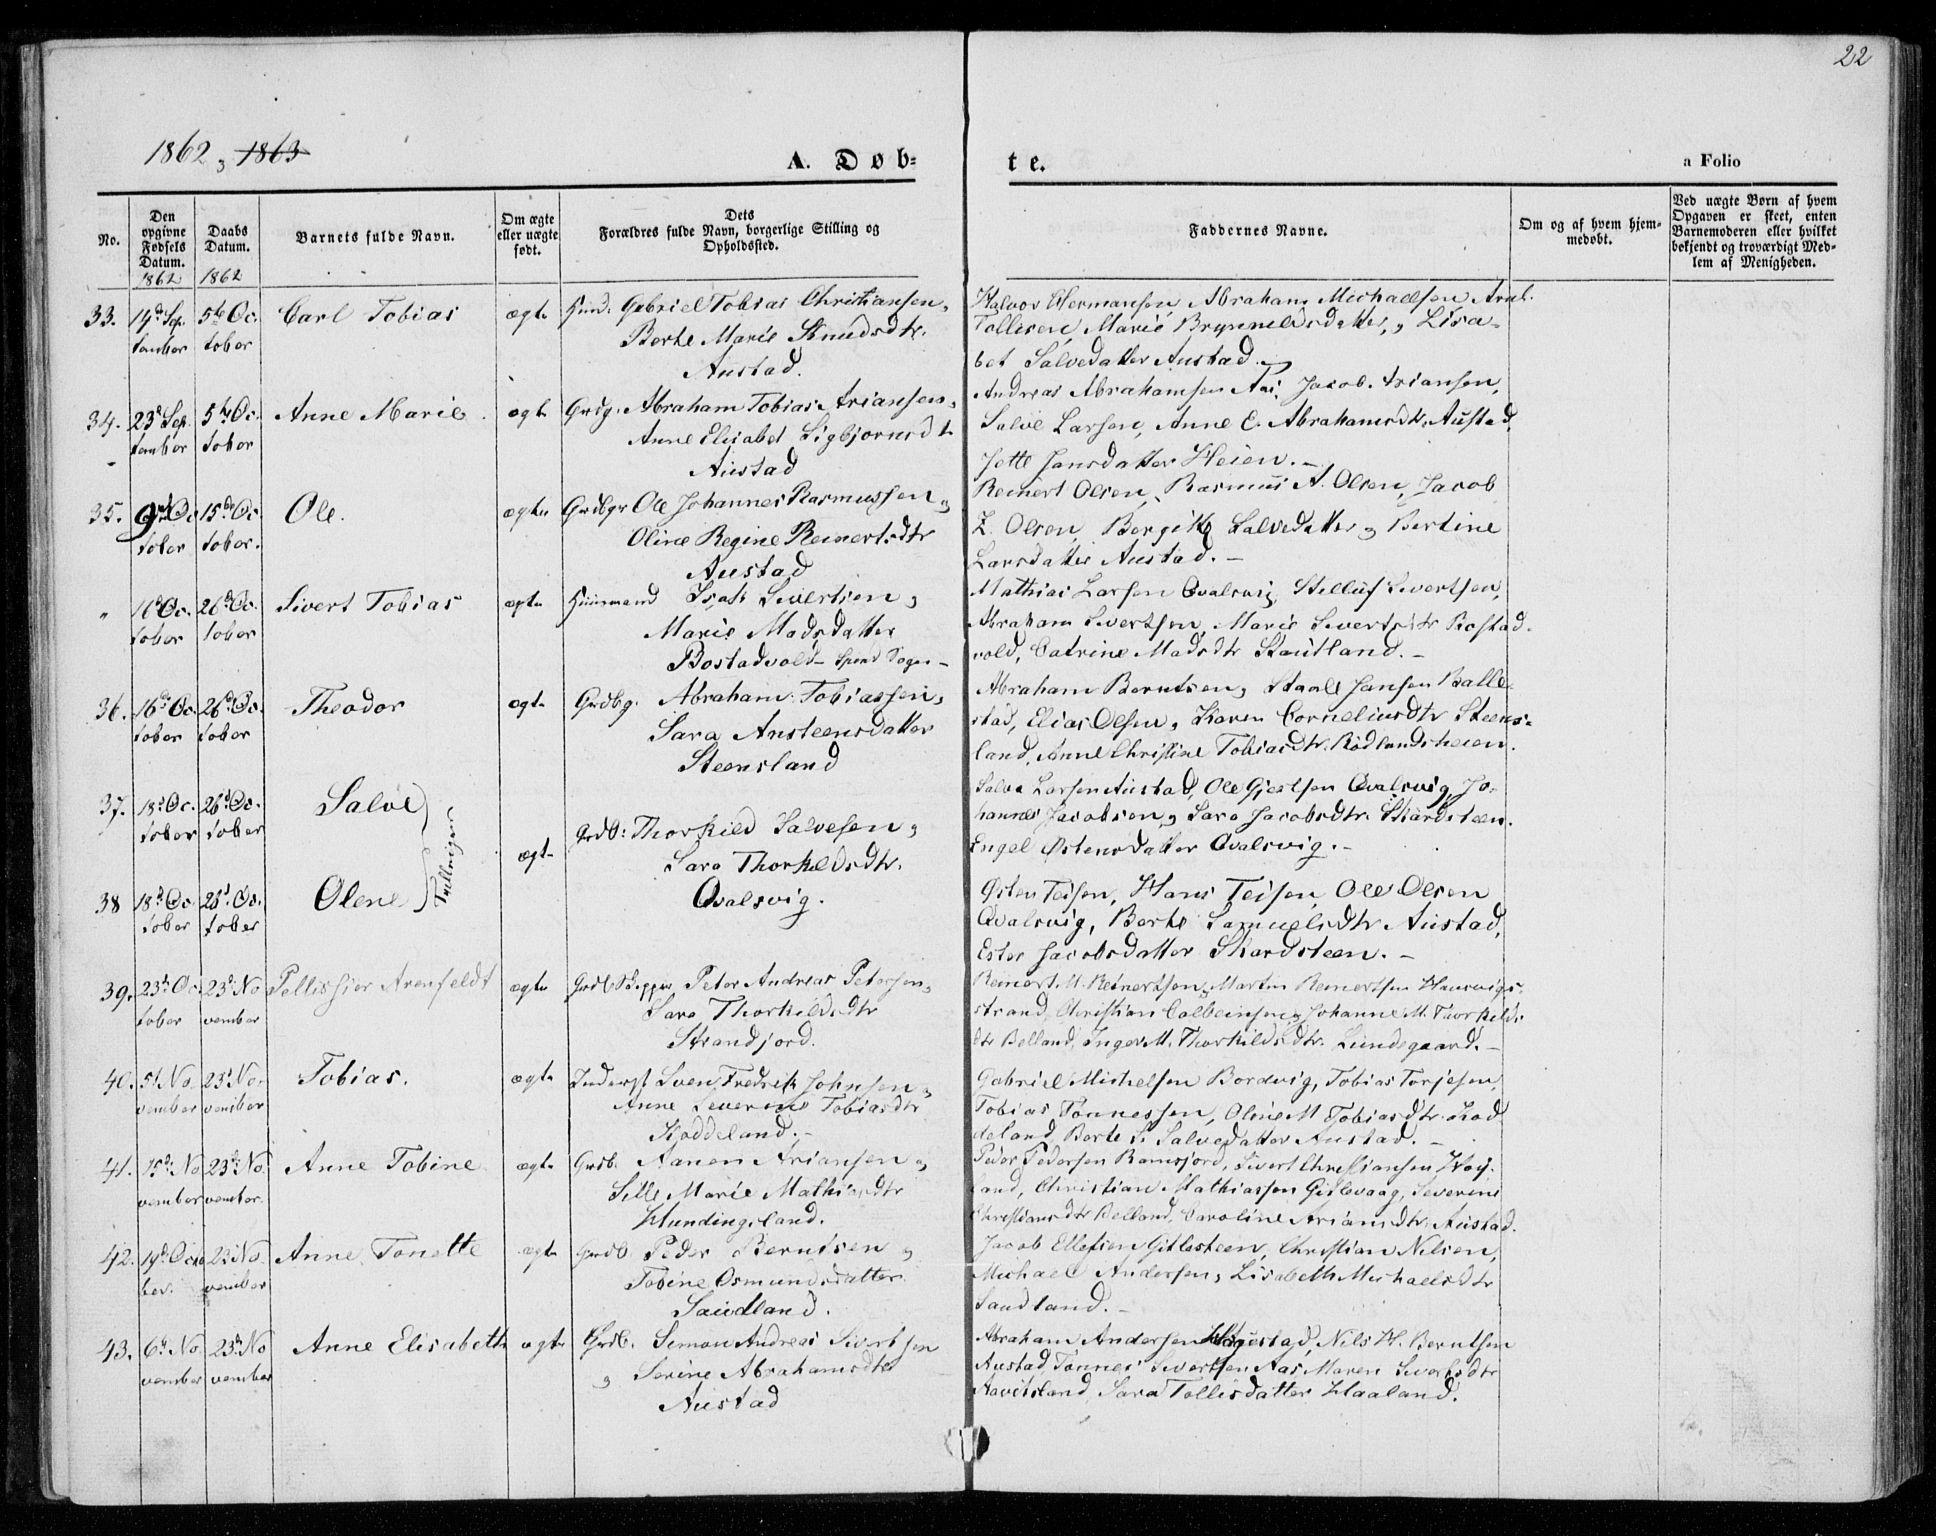 SAK, Lyngdal sokneprestkontor, F/Fa/Faa/L0002: Ministerialbok nr. A 2, 1858-1870, s. 22